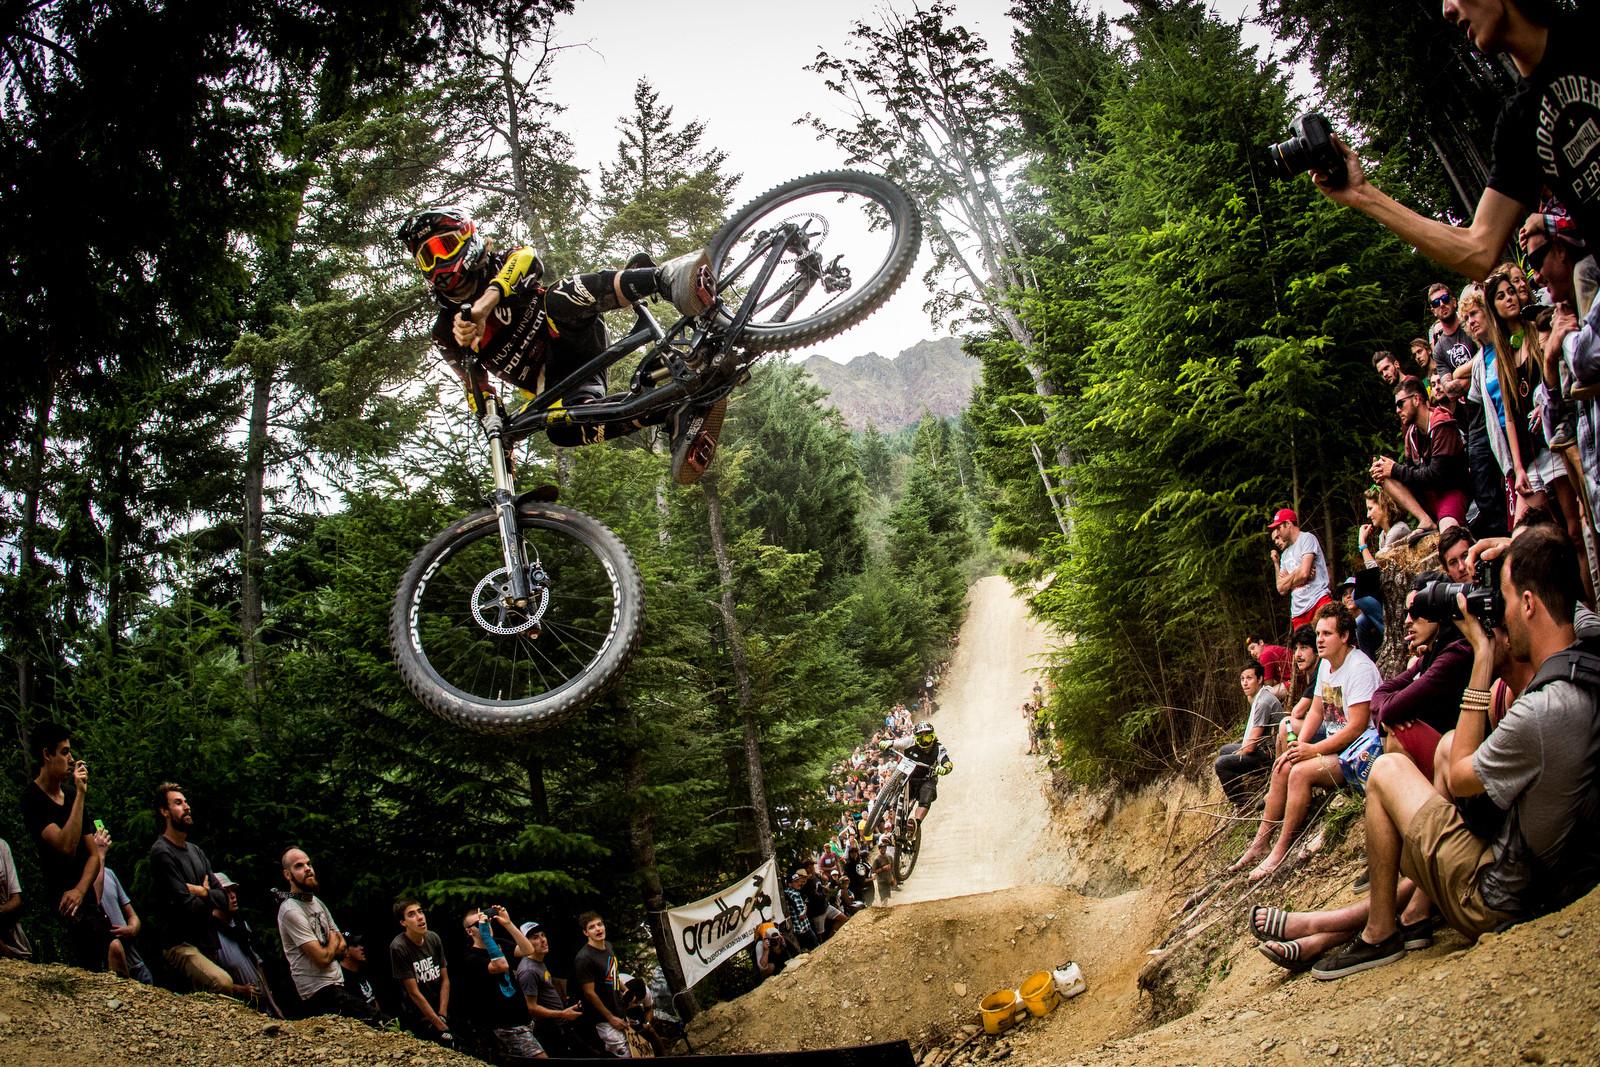 Remy Morton - Vertigo Bikes Whip Off at the Atlas Bar Wynyard Jam - Mountain Biking Pictures - Vital MTB